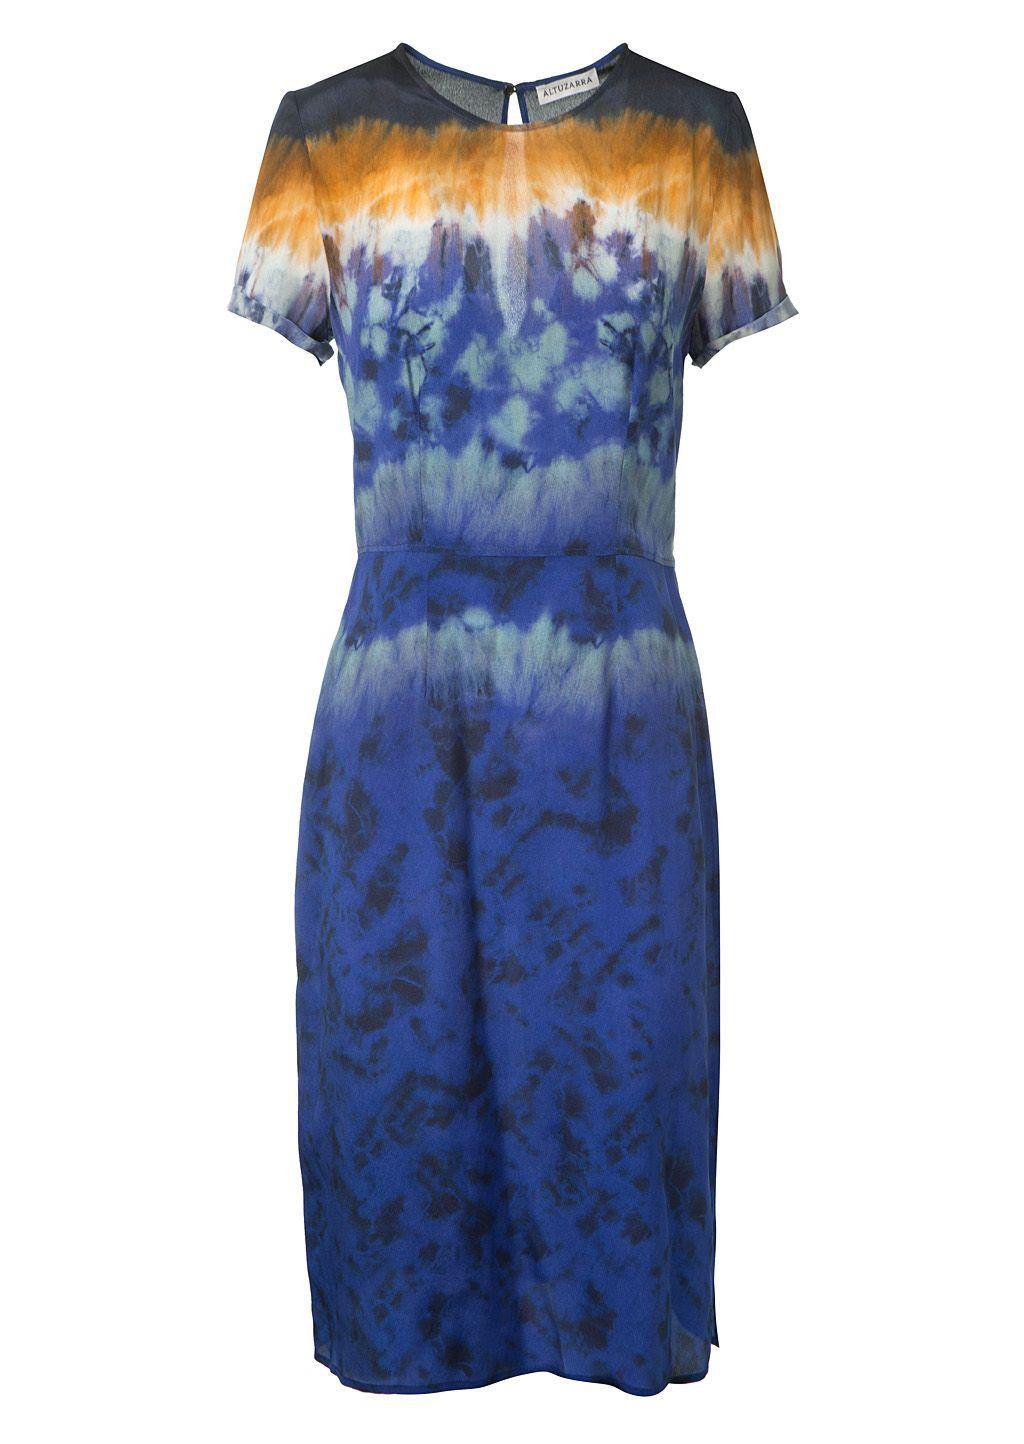 Altuzarra Tie Dye Satin Silk Dress Cloth Blue